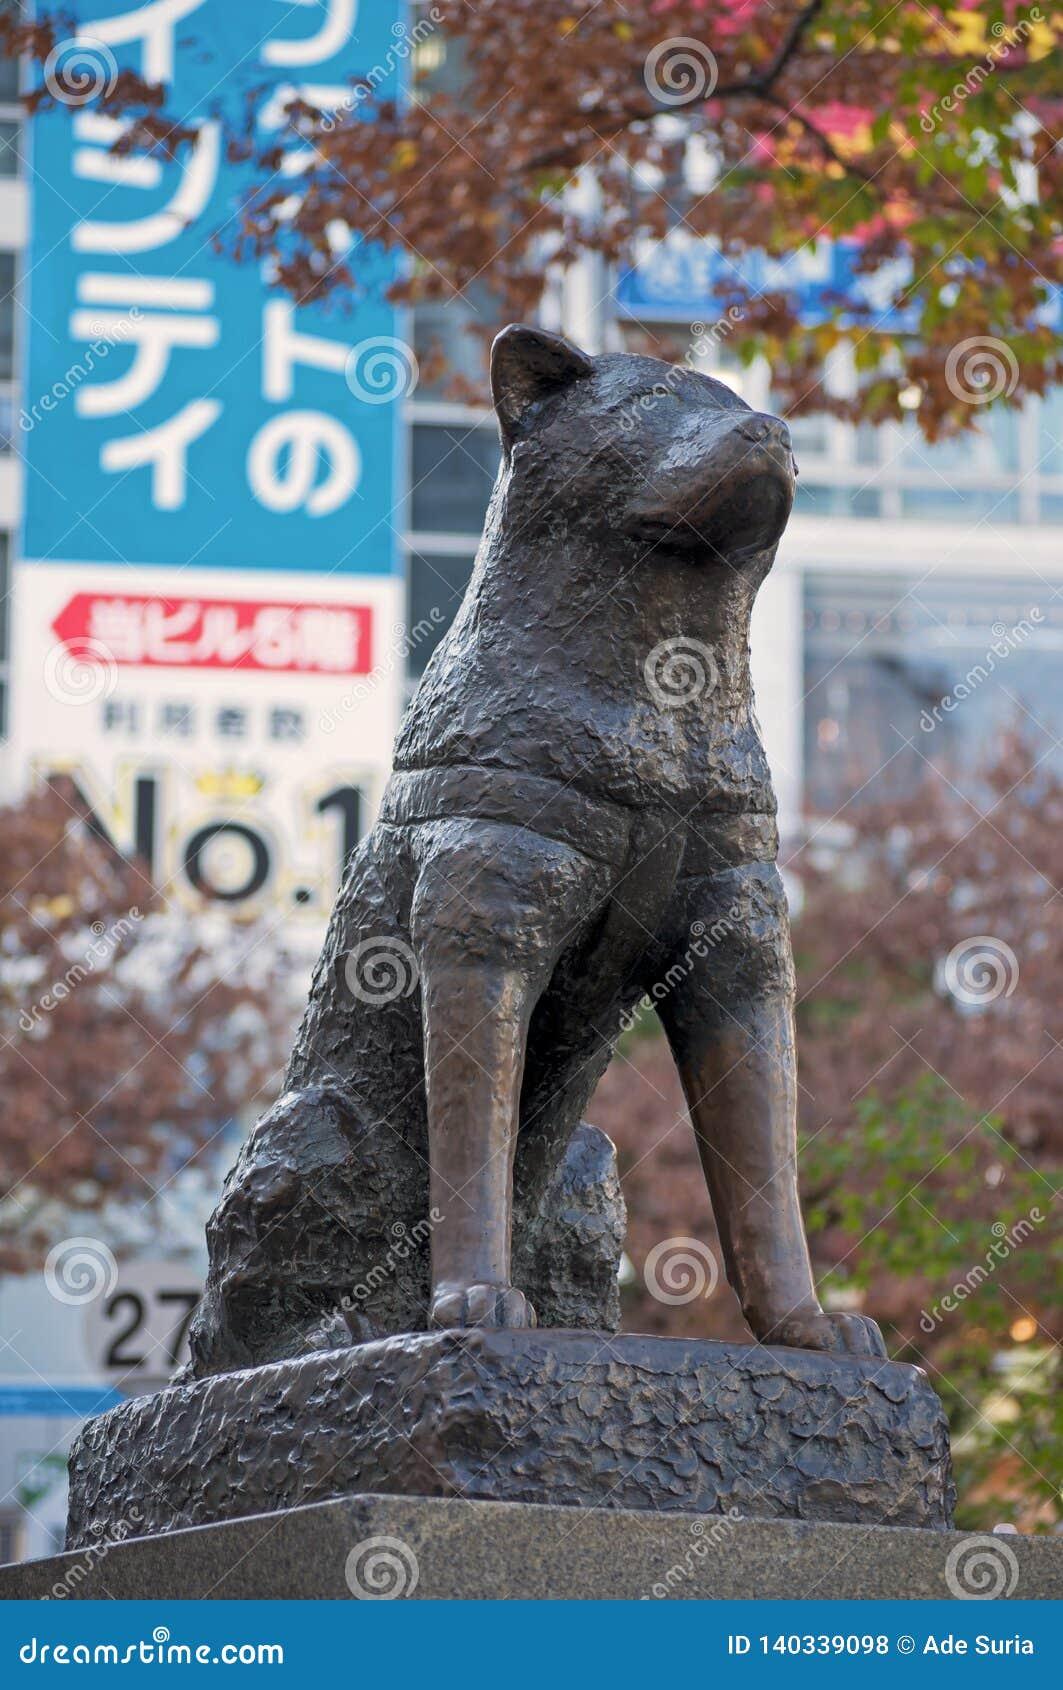 Hachiko-Statue in Shibuya, Japan